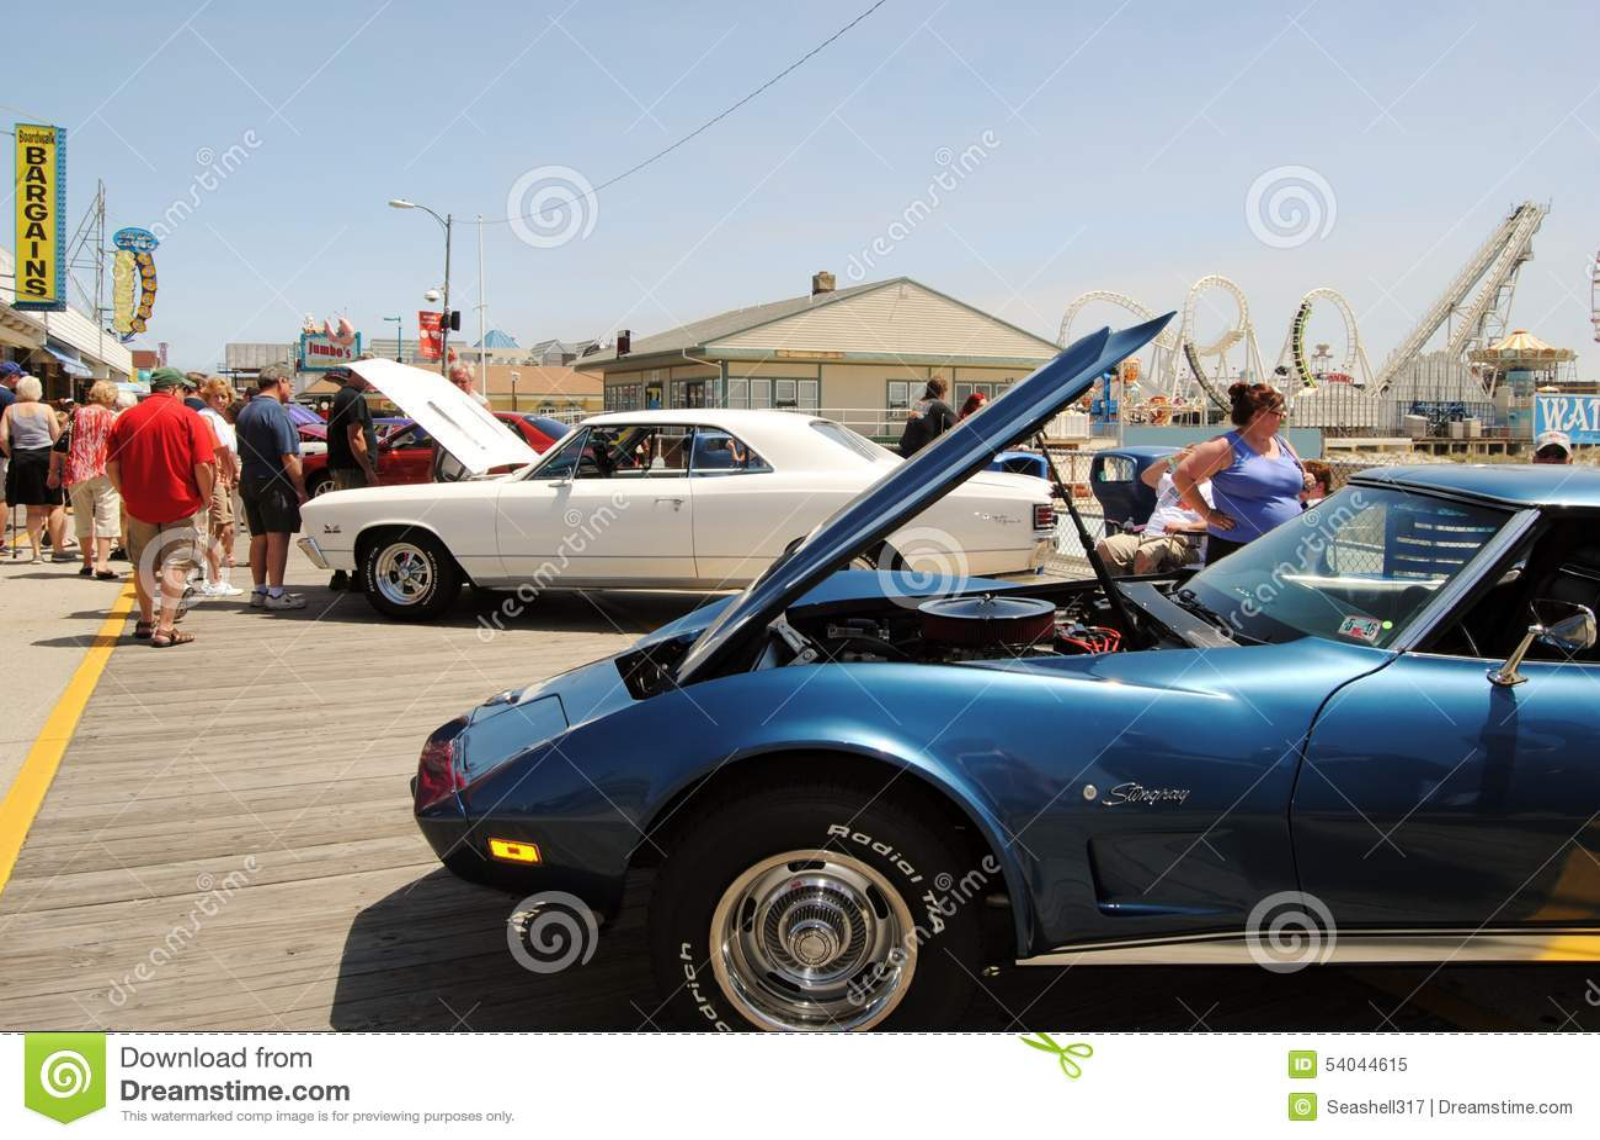 Wildwood Boardwalk Car Show